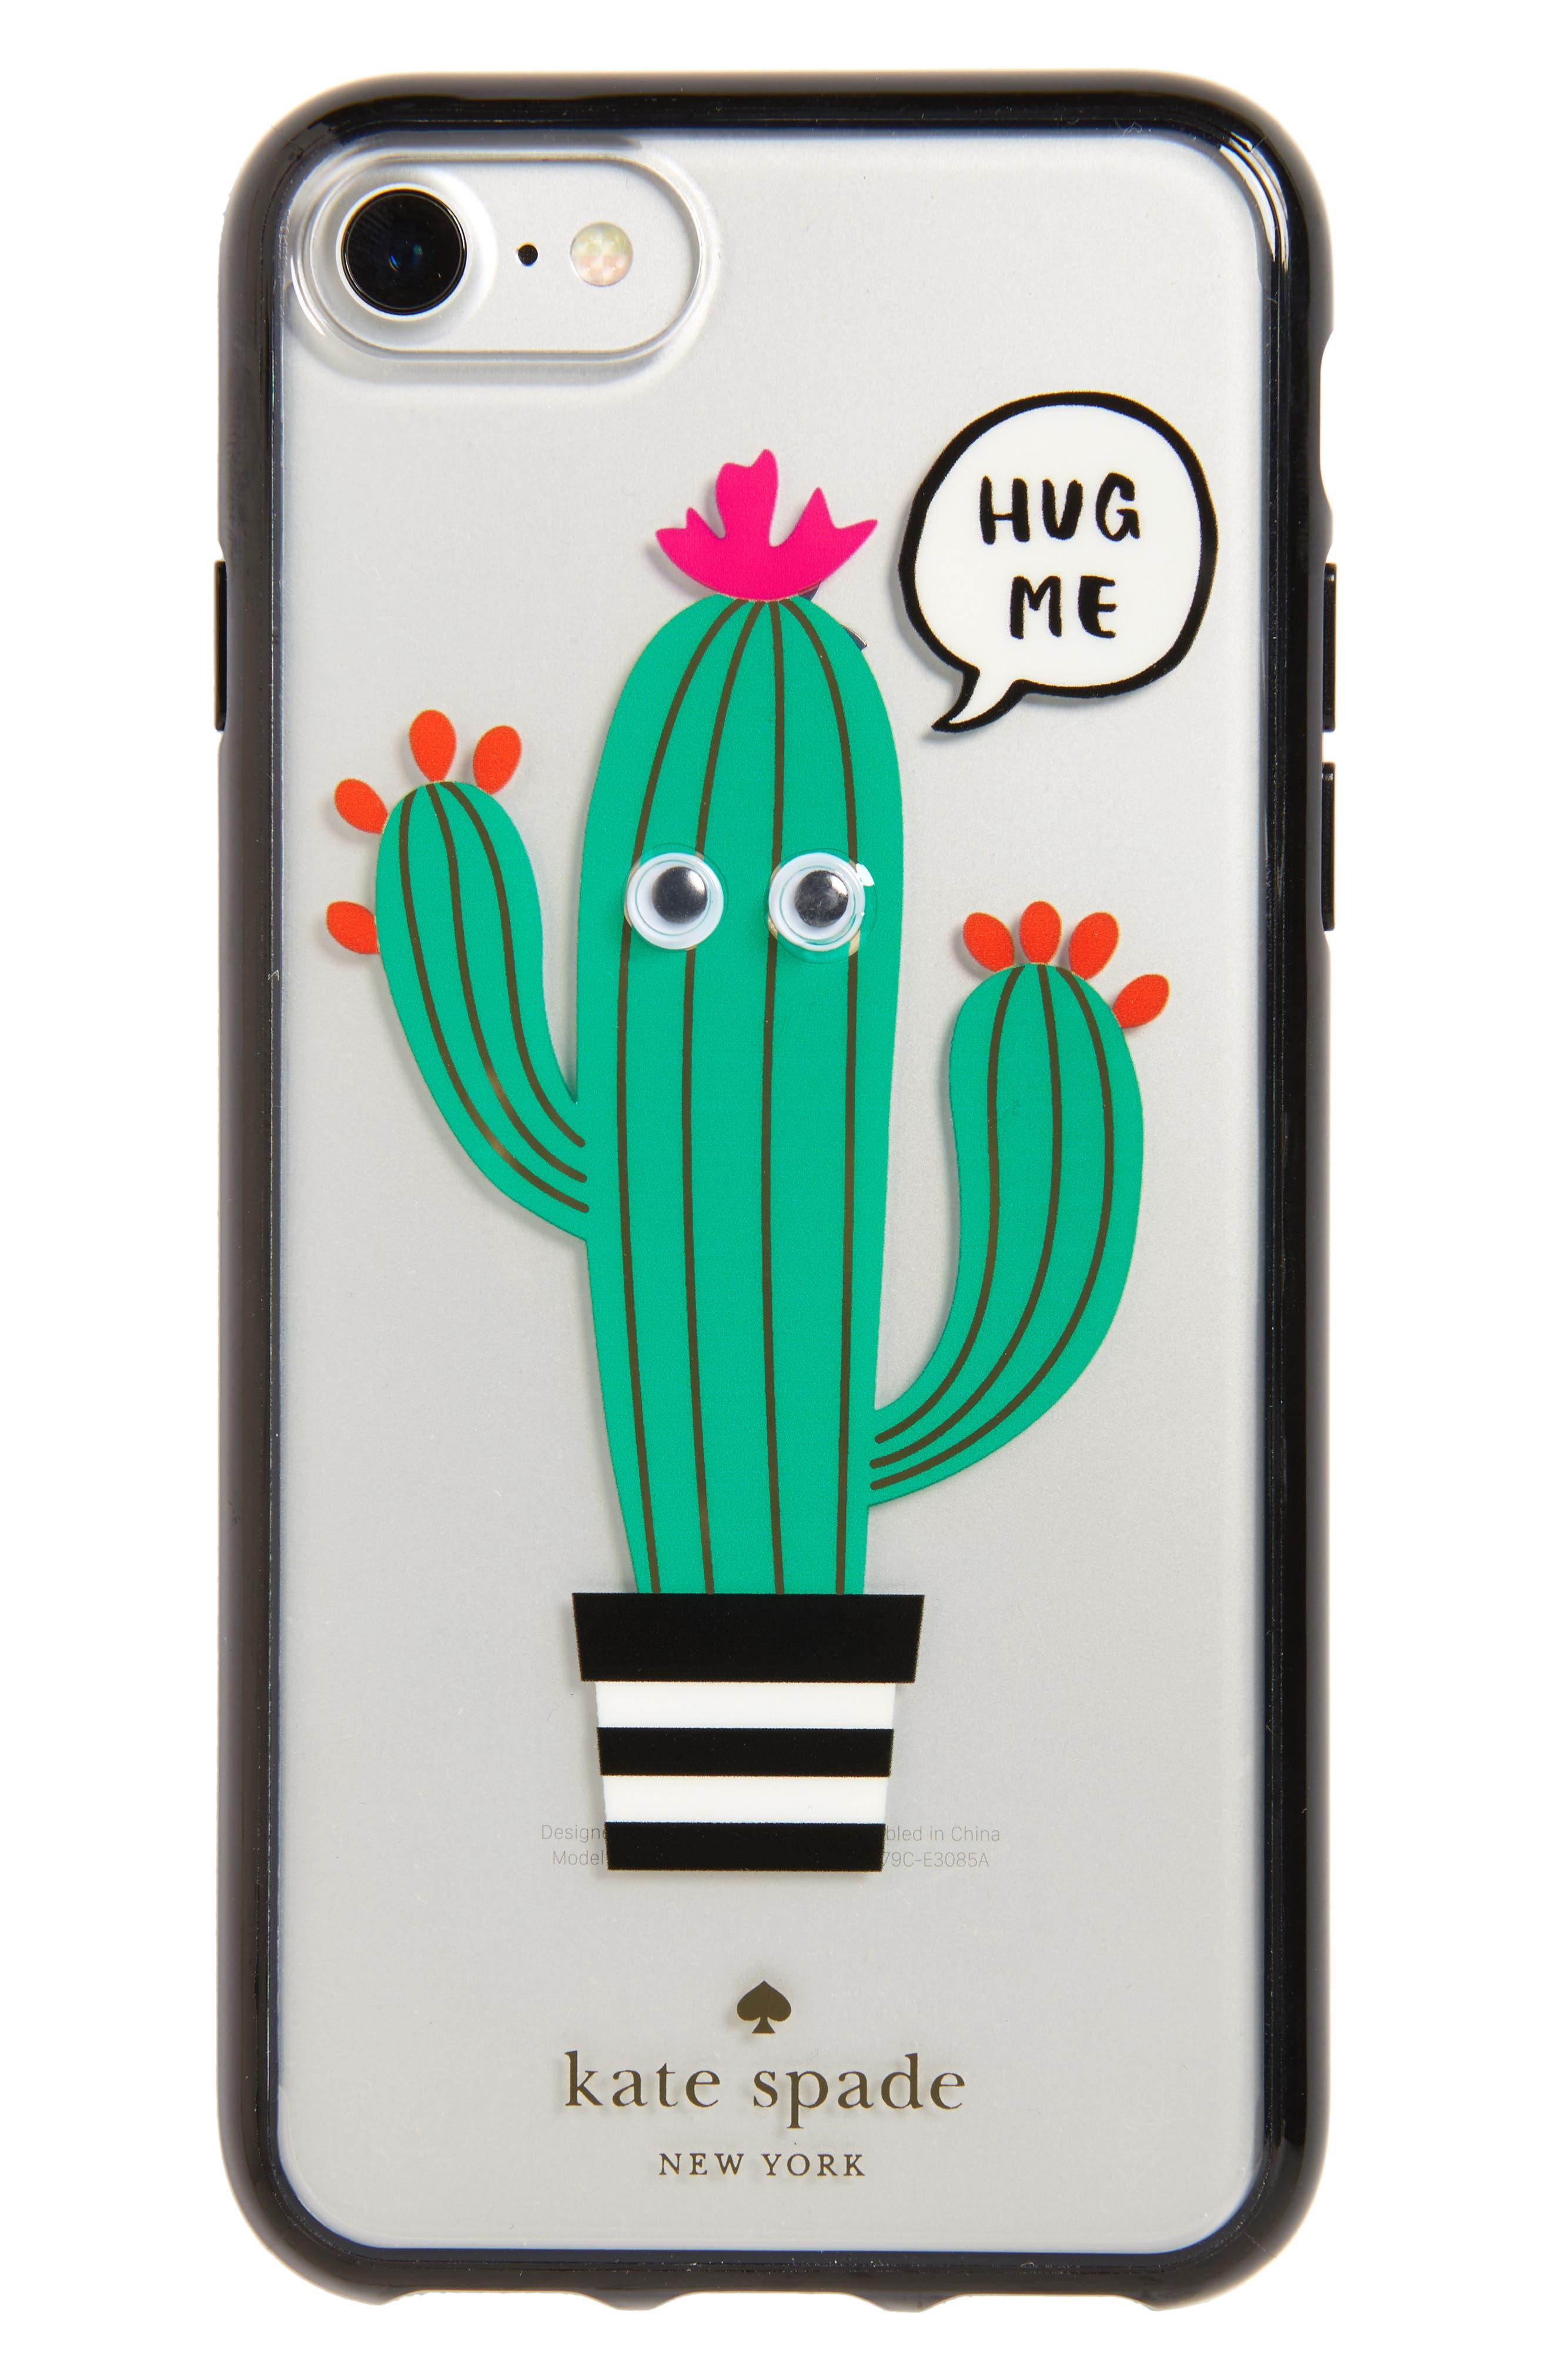 kate spade new york hug me iPhone 7/8 case